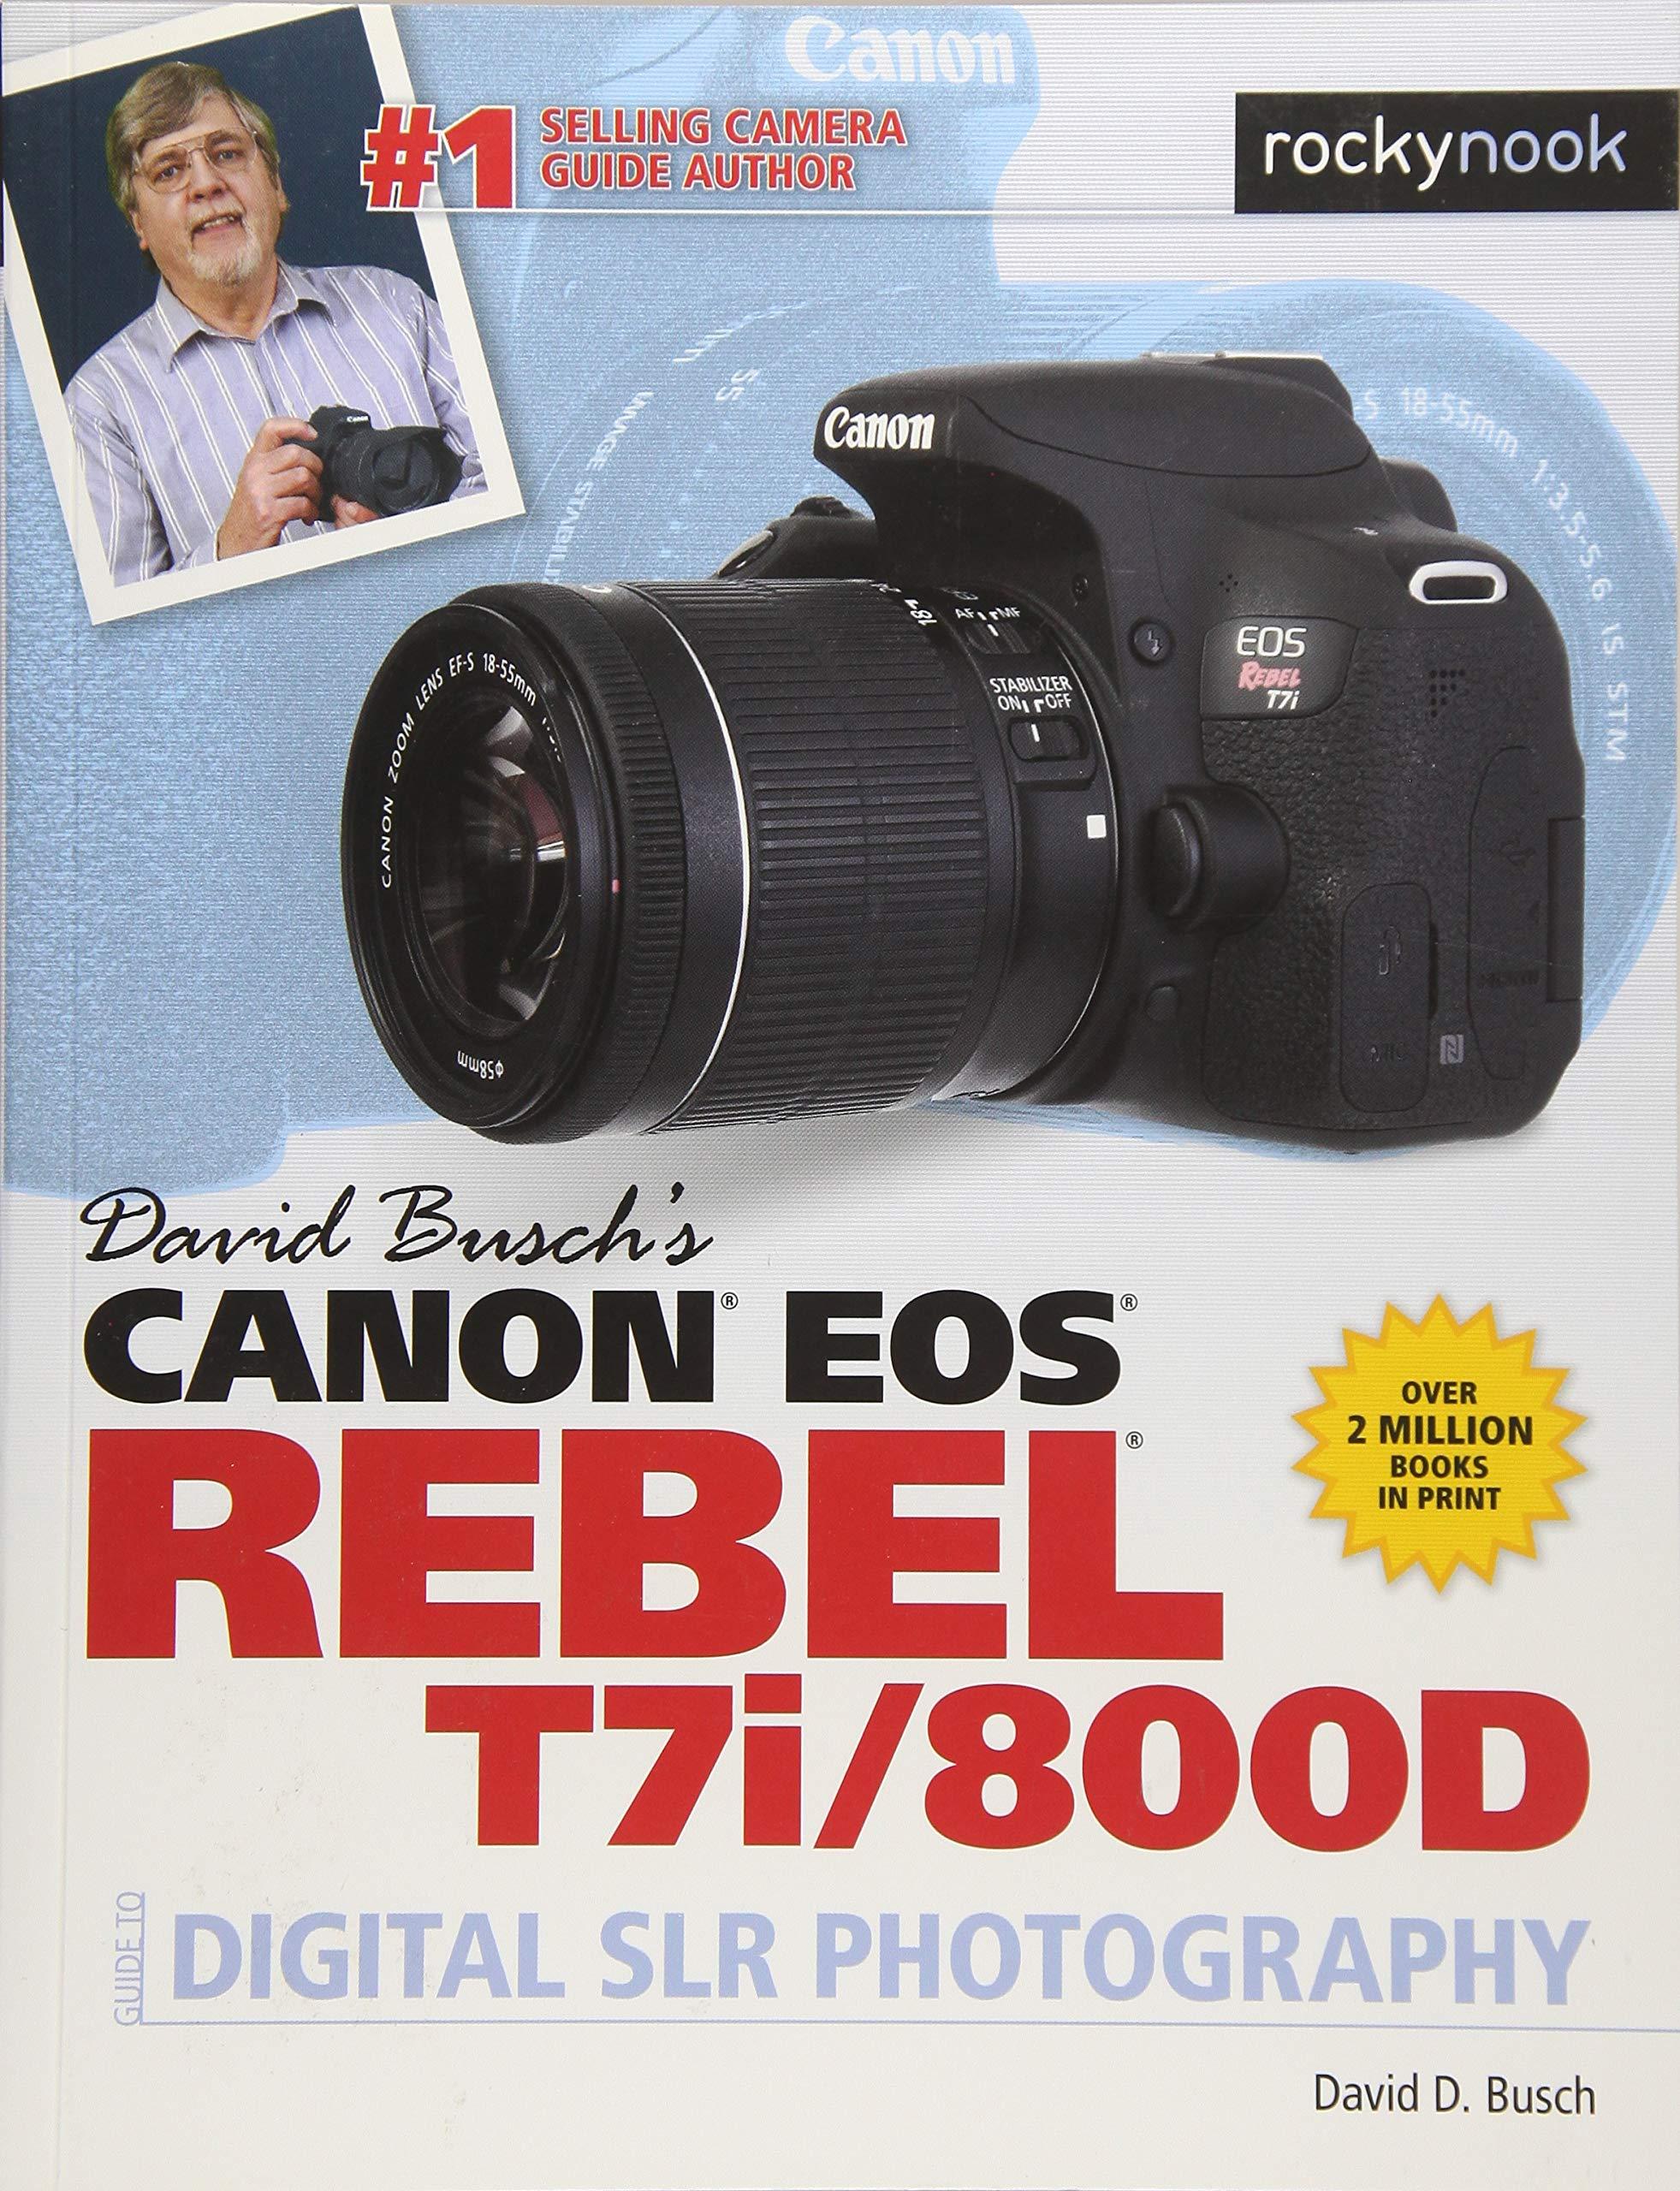 David Buschs Canon EOS Rebel T7i/800d Guide to Digital Slr ...